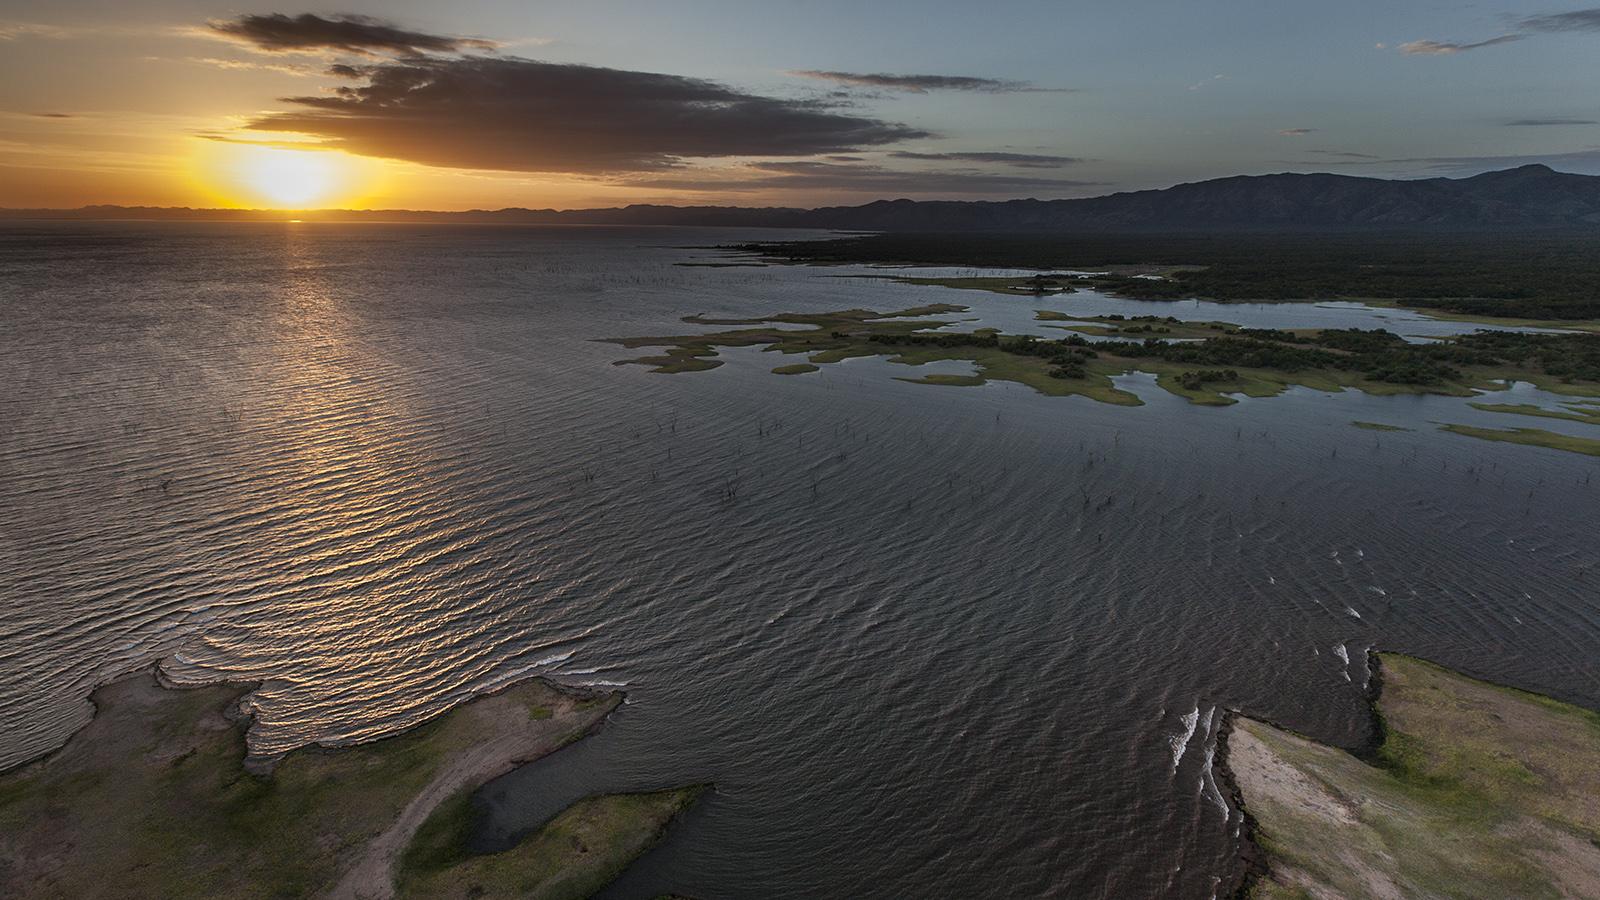 Exposted shoreline of Lake Kariba - Photo by Rae Kokeš